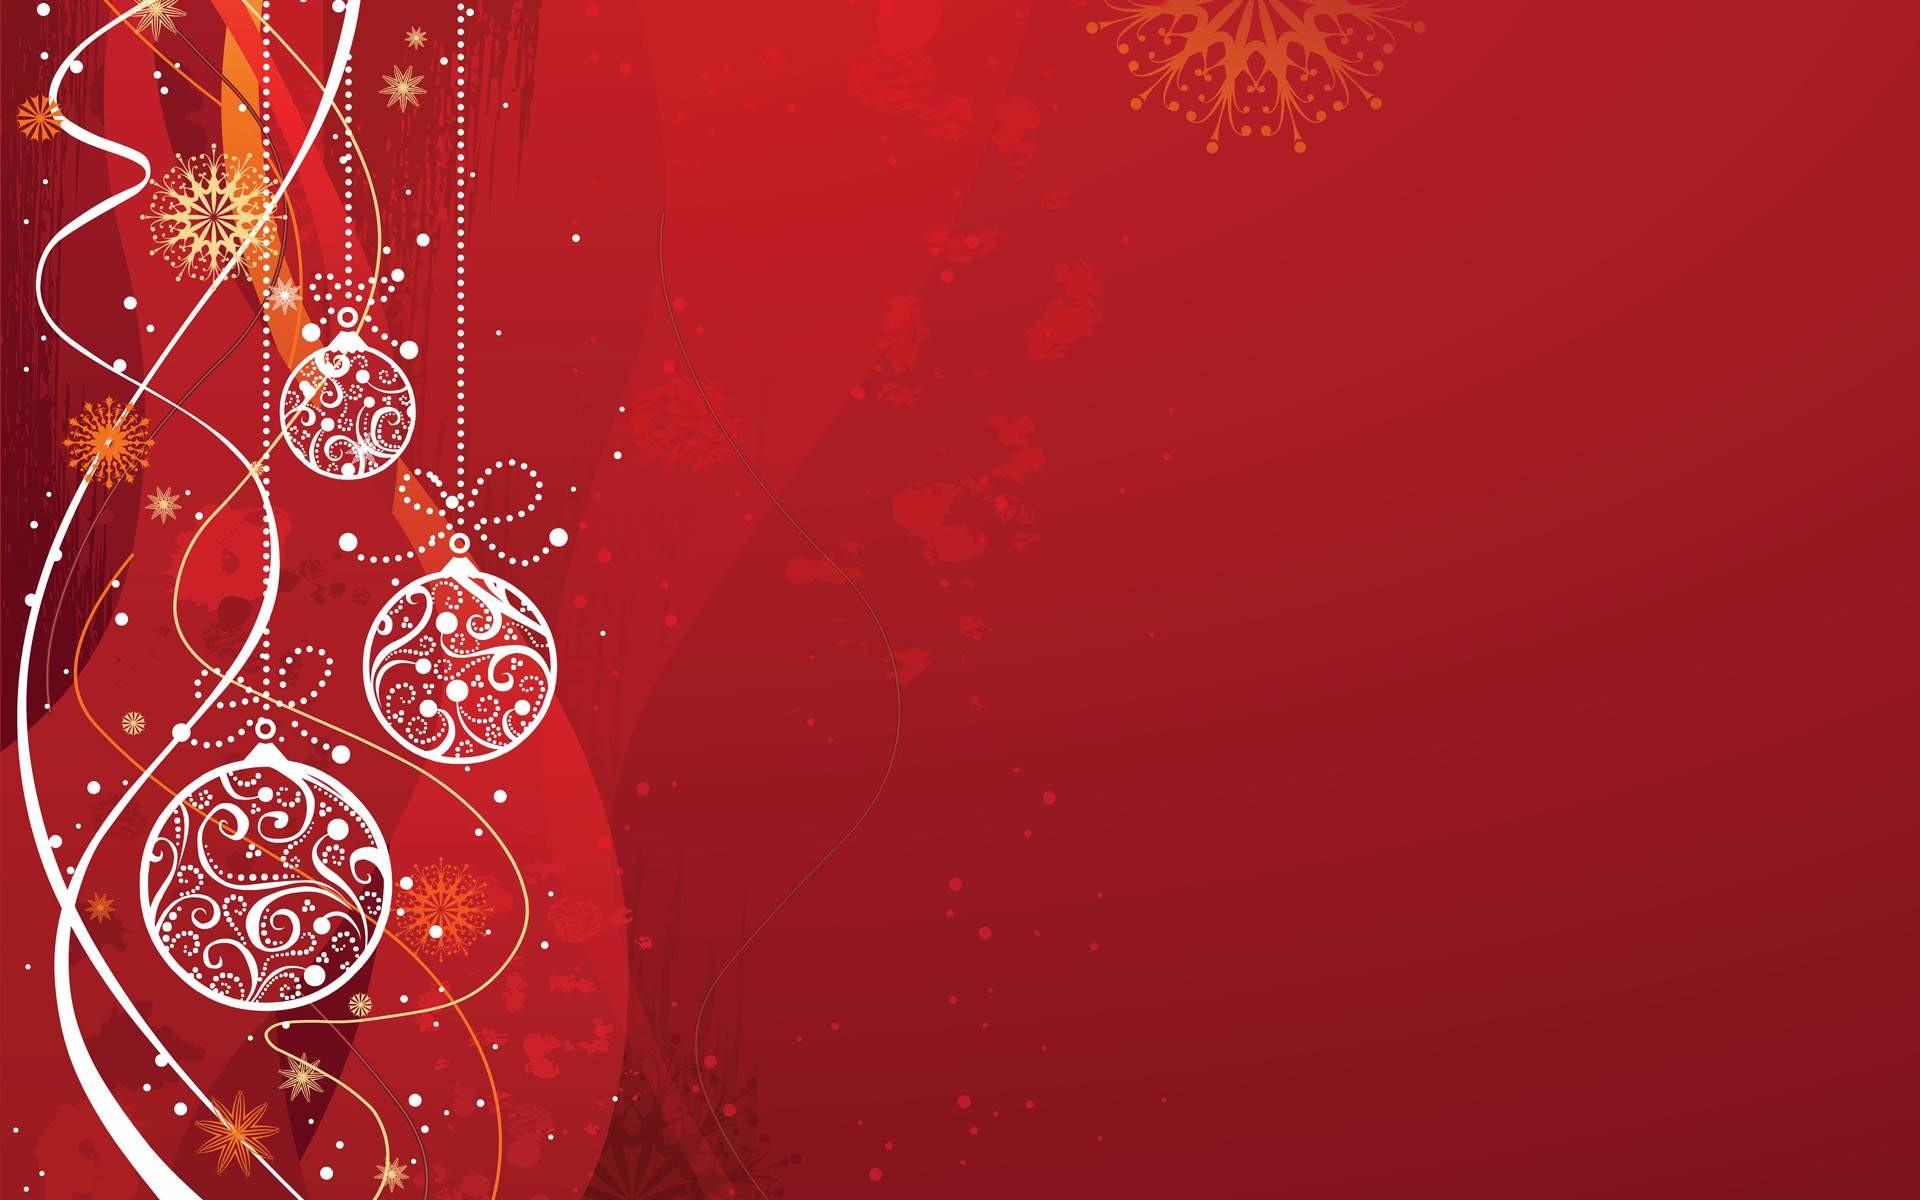 Christmas Background Christian.Religious Christmas Wallpaper Christmas Backgrounds 49 Images